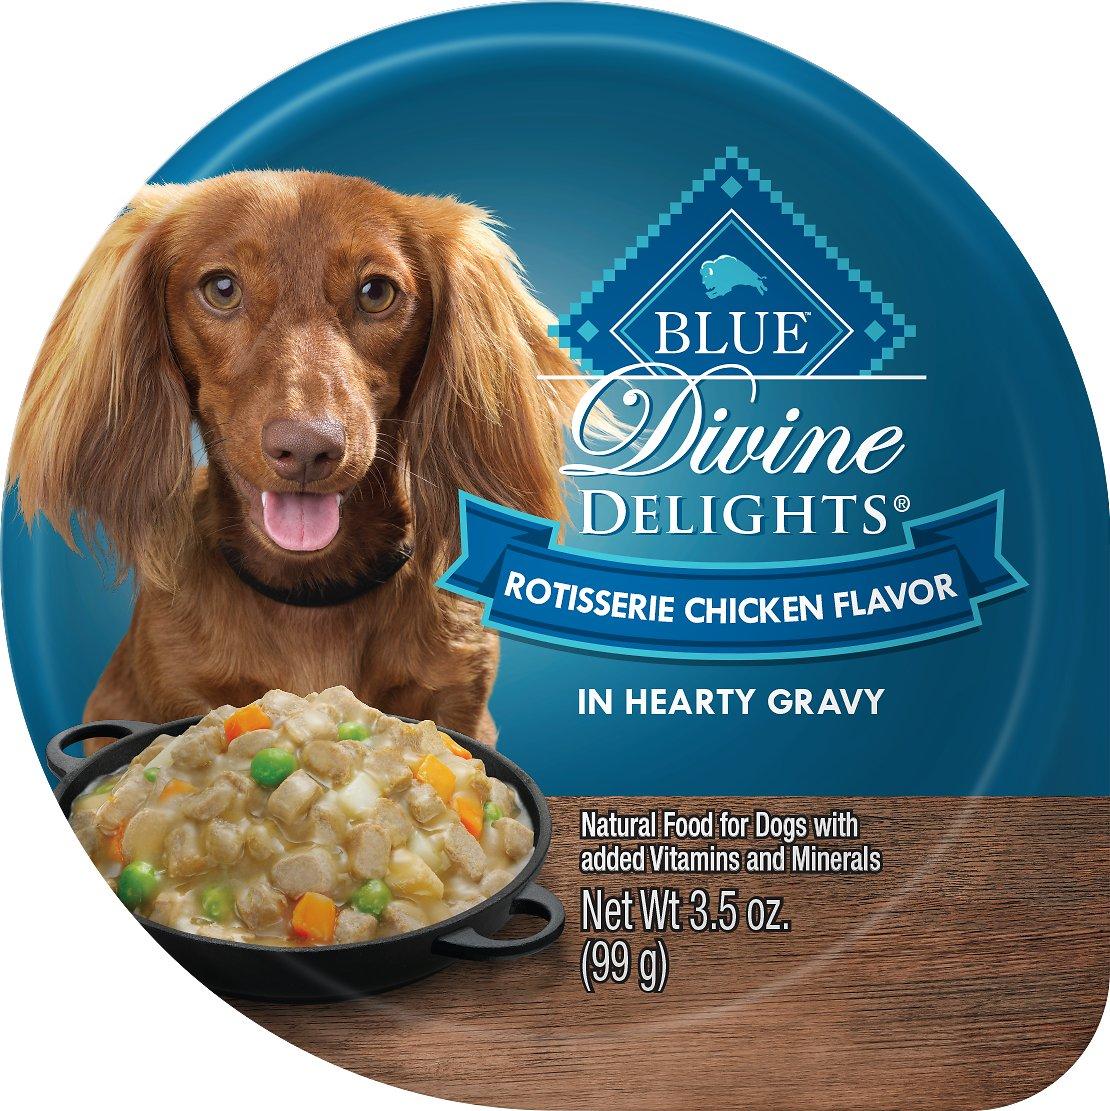 Blue Buffalo Divine Delights Rotisserie Chicken Flavor Hearty Gravy Dog Food Trays Image